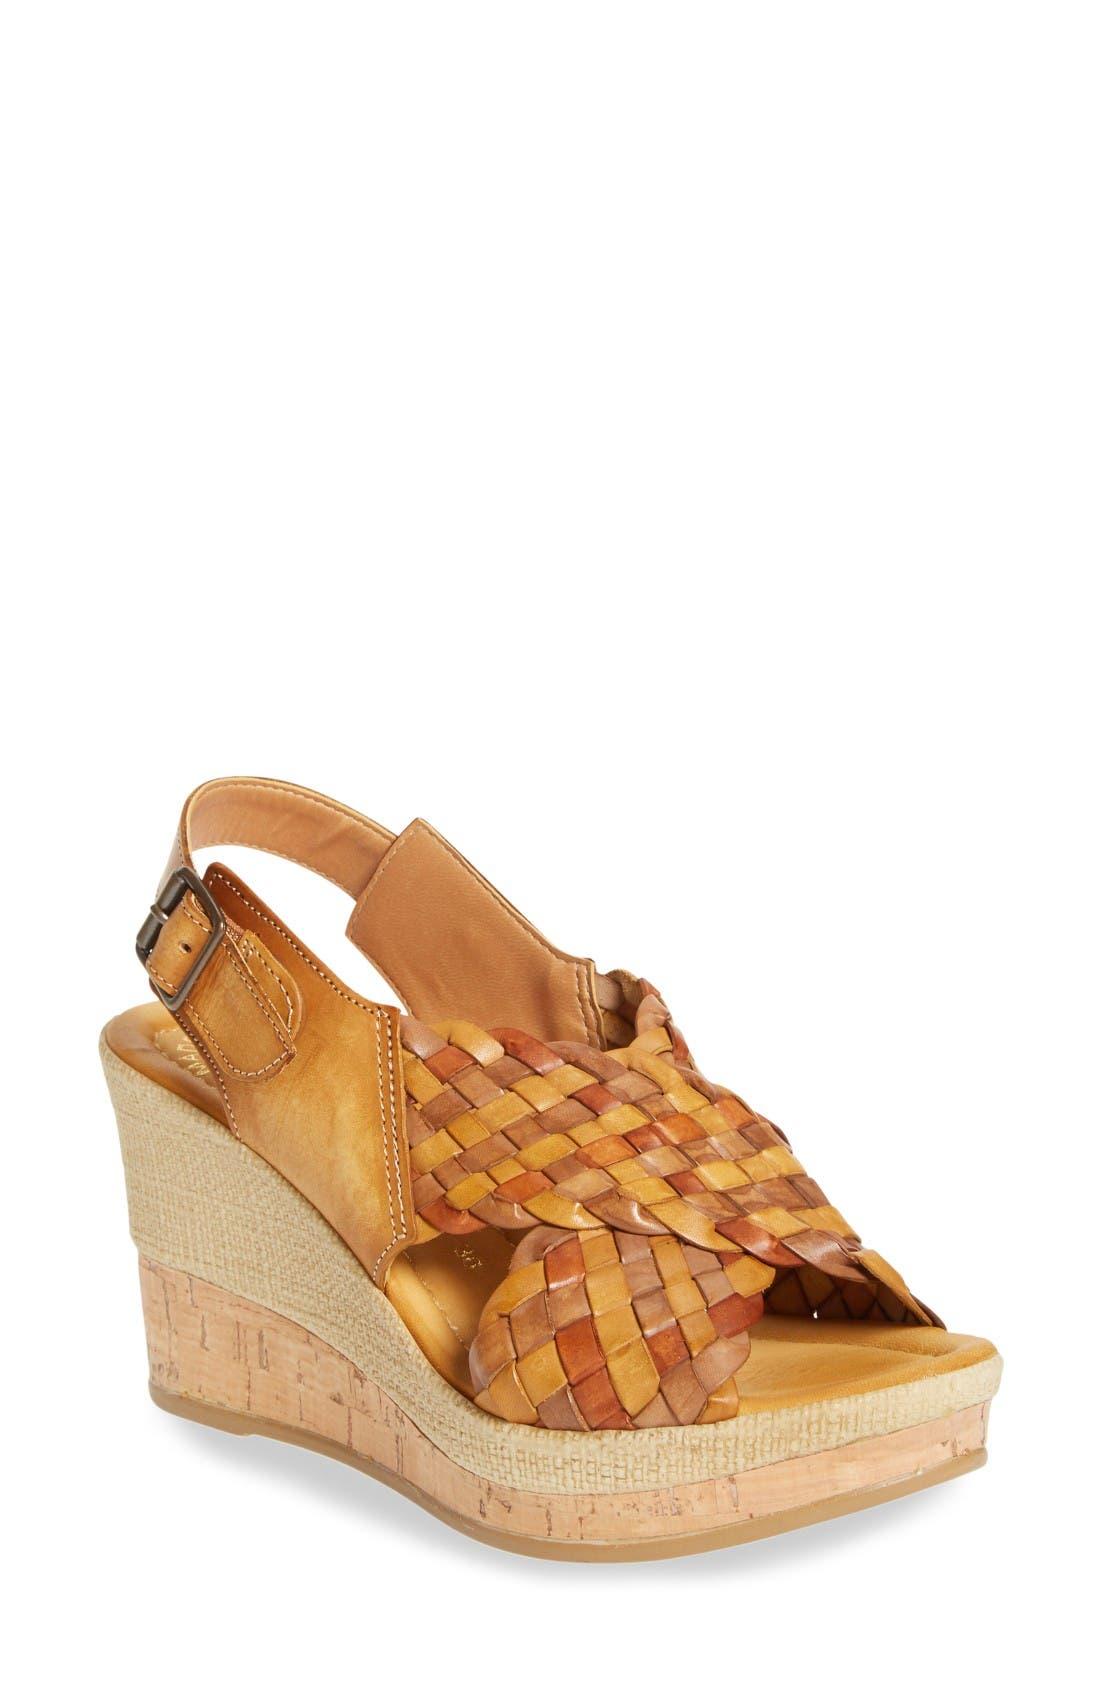 Alternate Image 1 Selected - Napa Flex Love Wedge Sandal (Women)